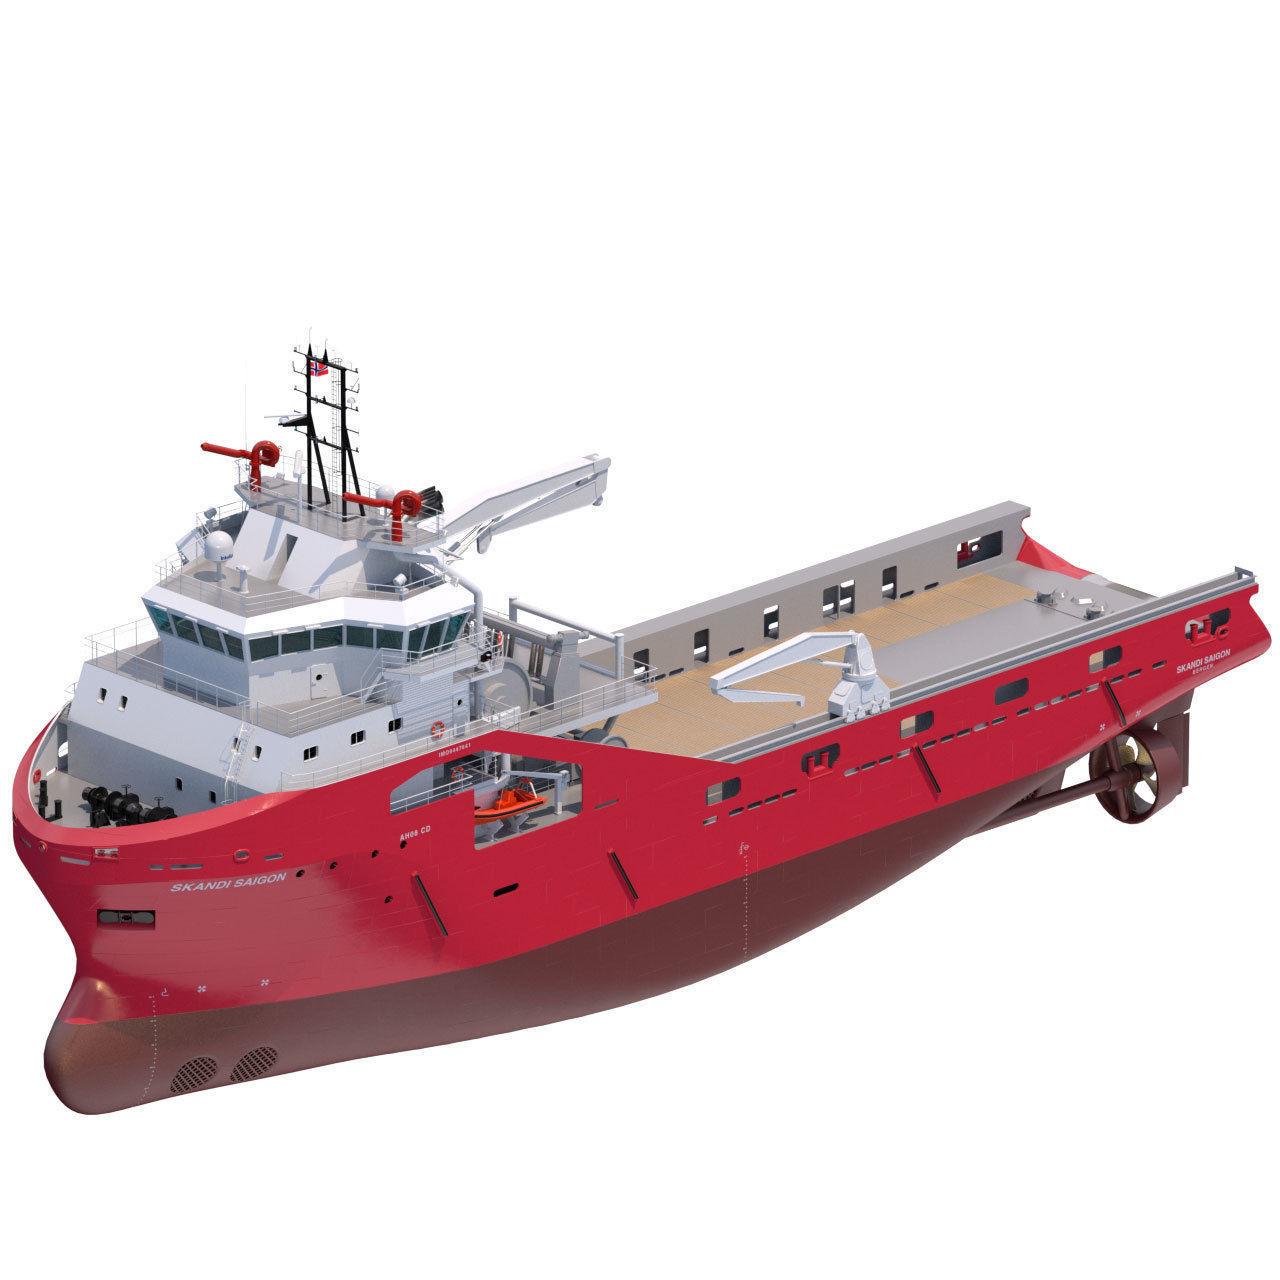 75 m AHTS Supply Vessel Skandi Saigon